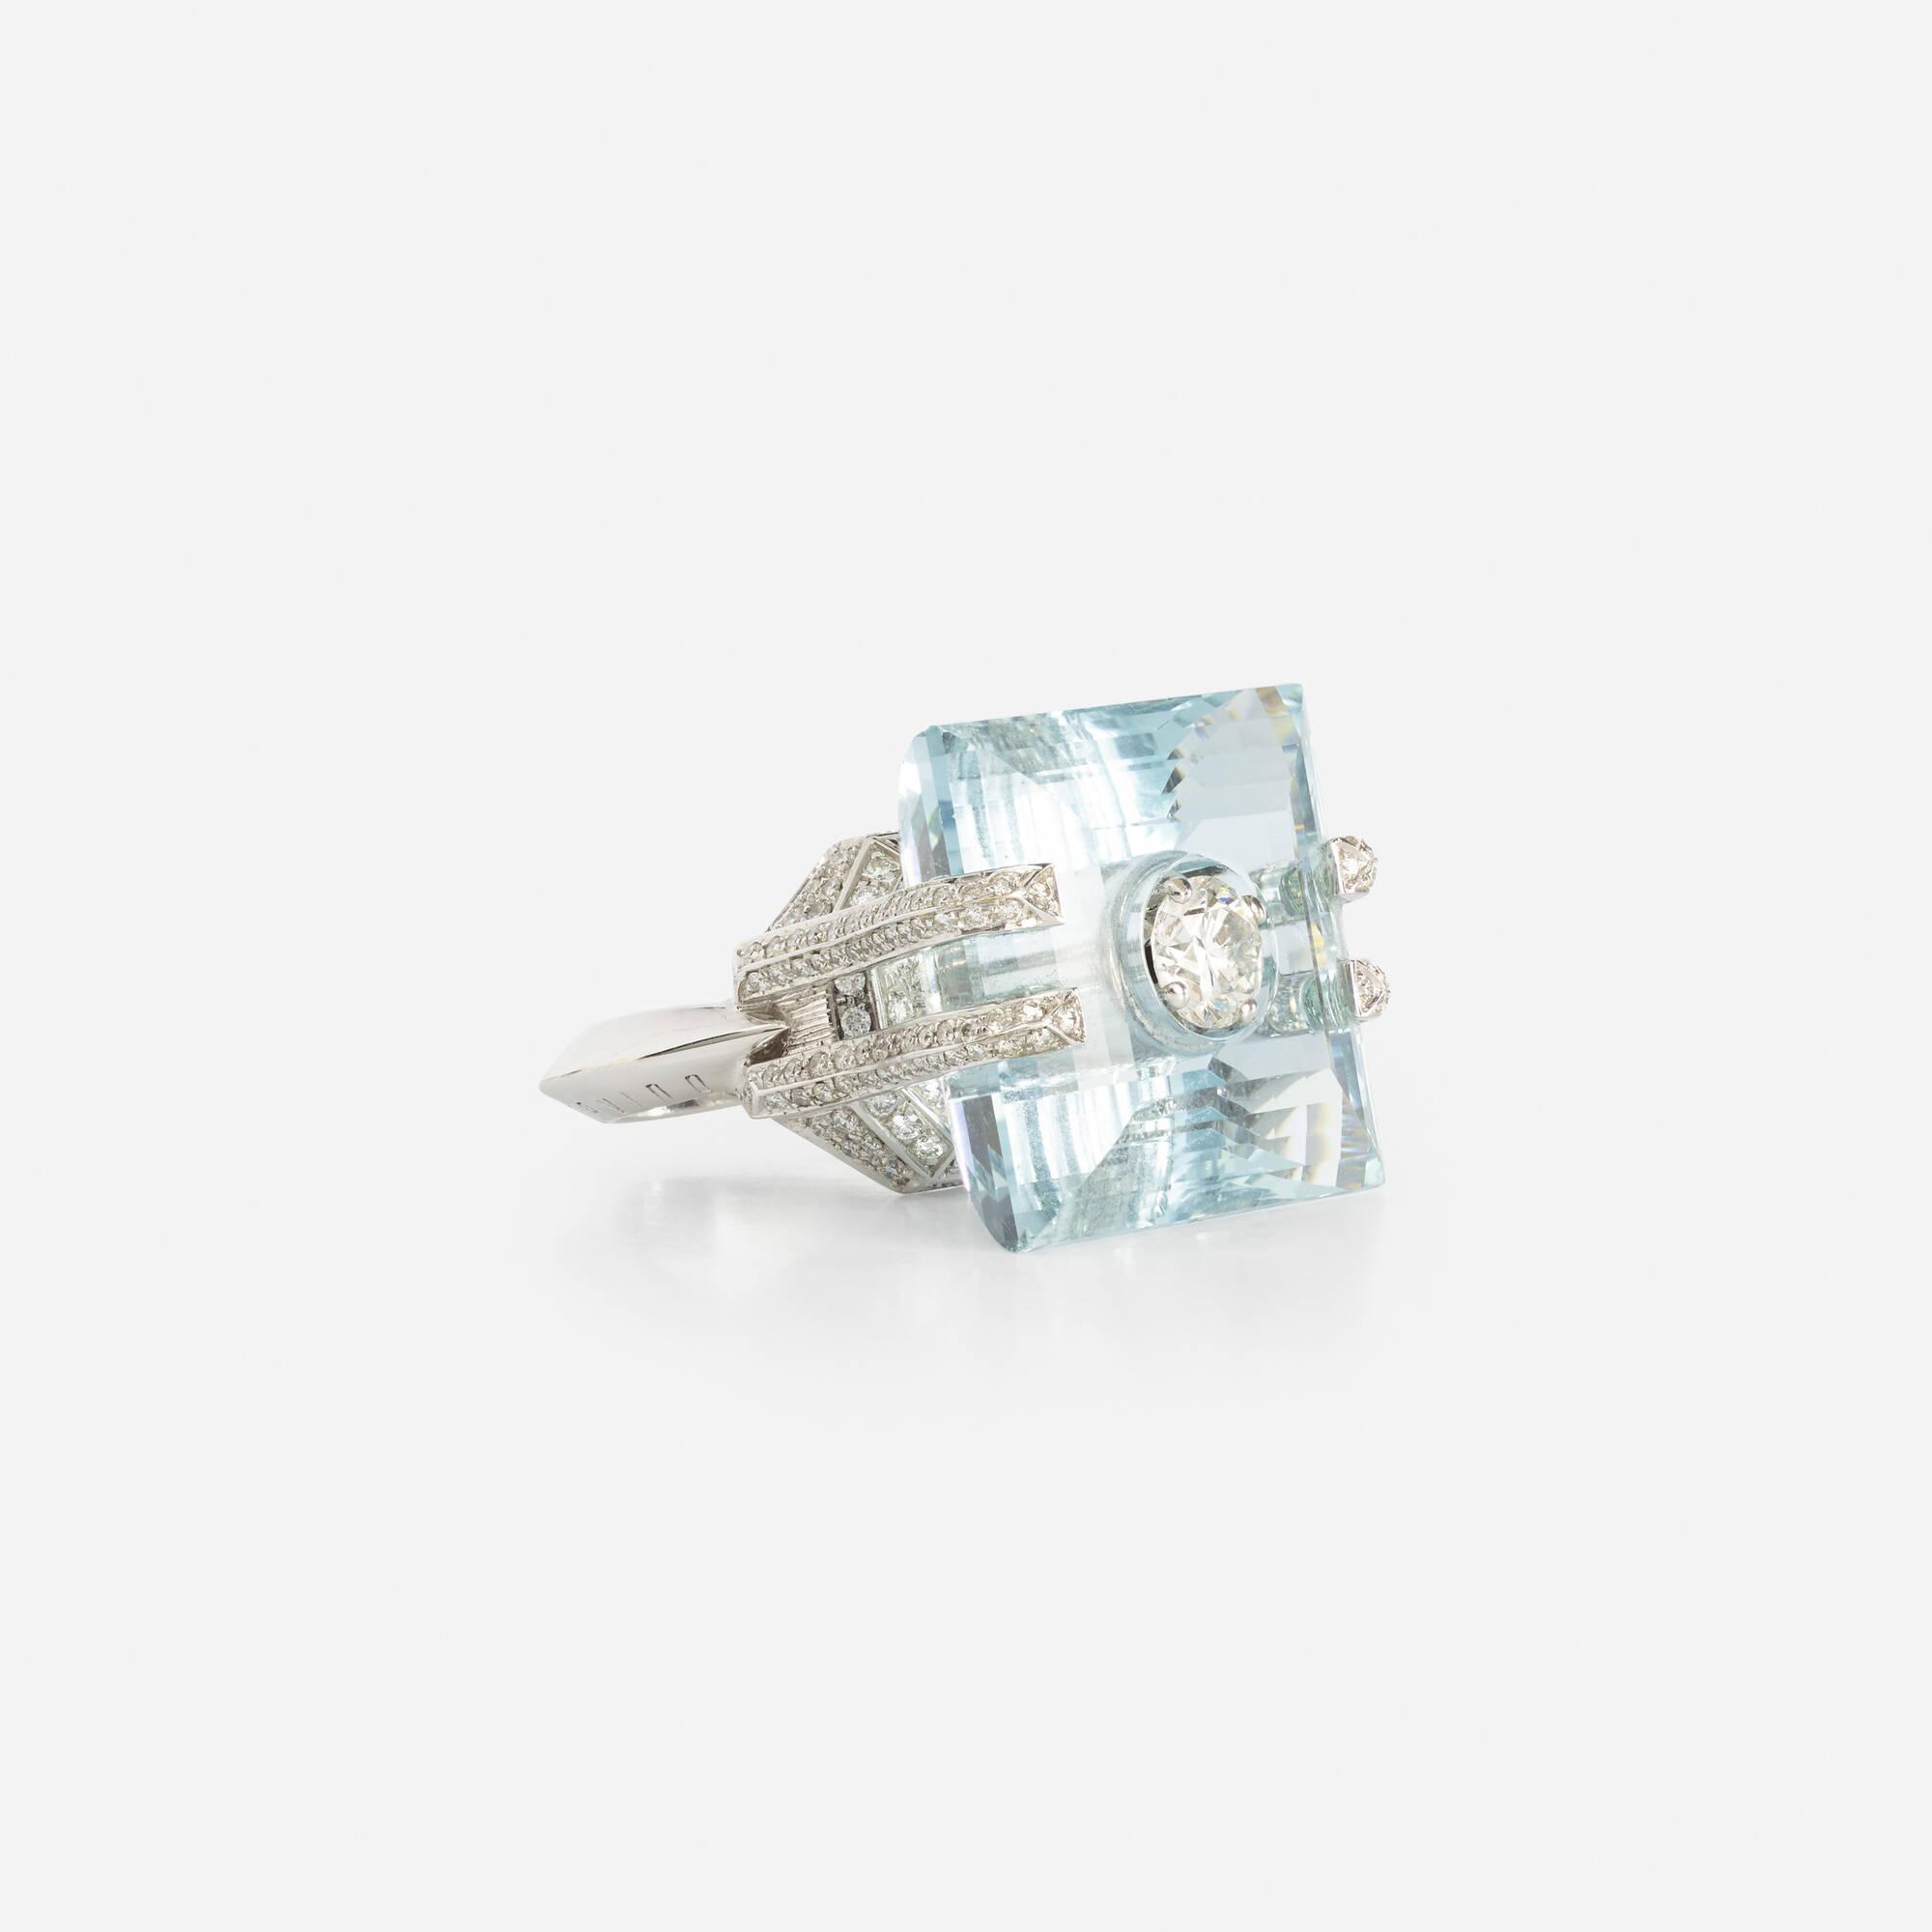 108: Corvino / A gold, aquamarine and diamond ring (1 of 3)